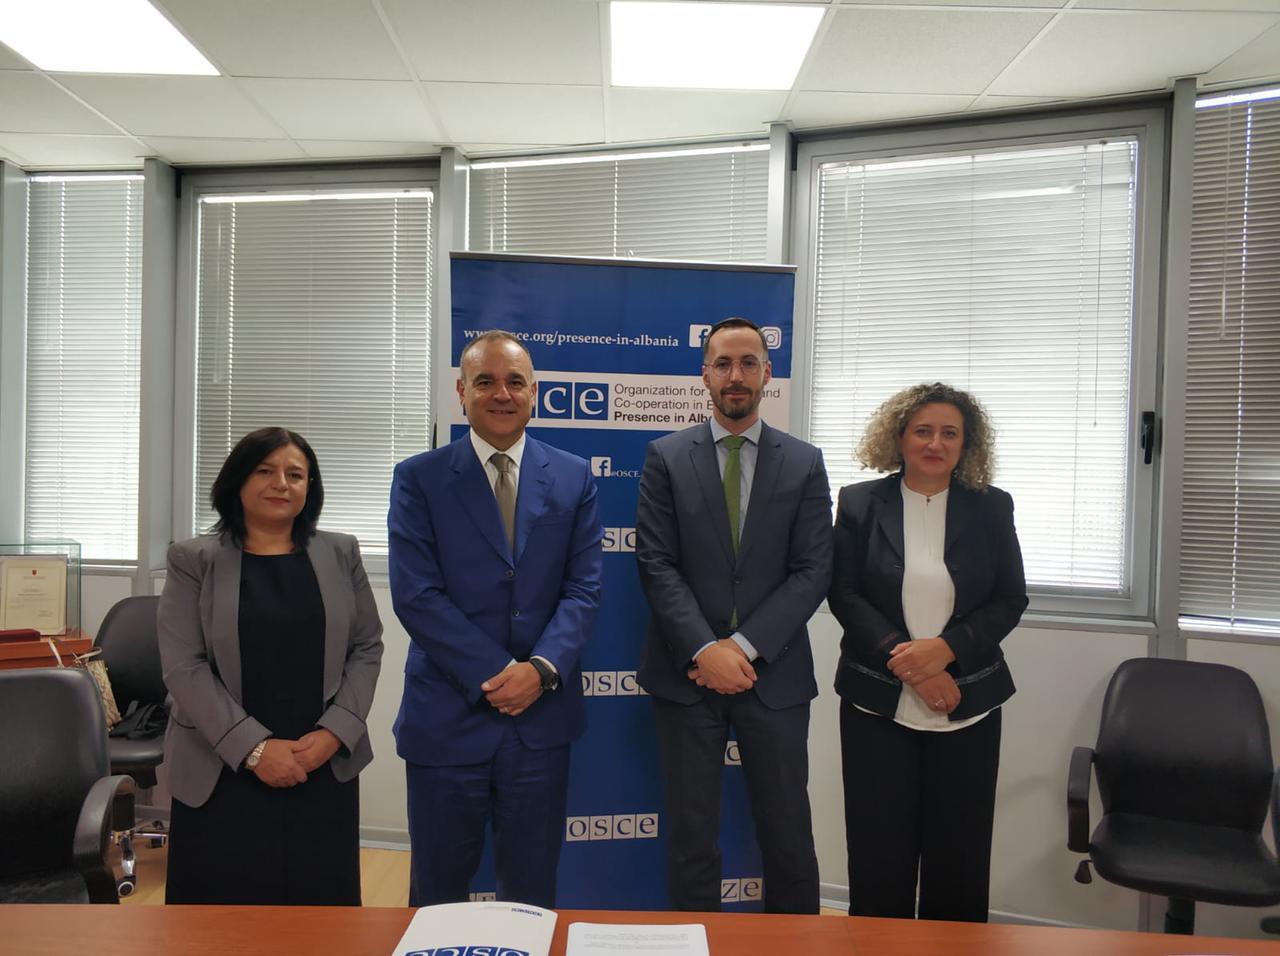 Foto - OSCE - 3